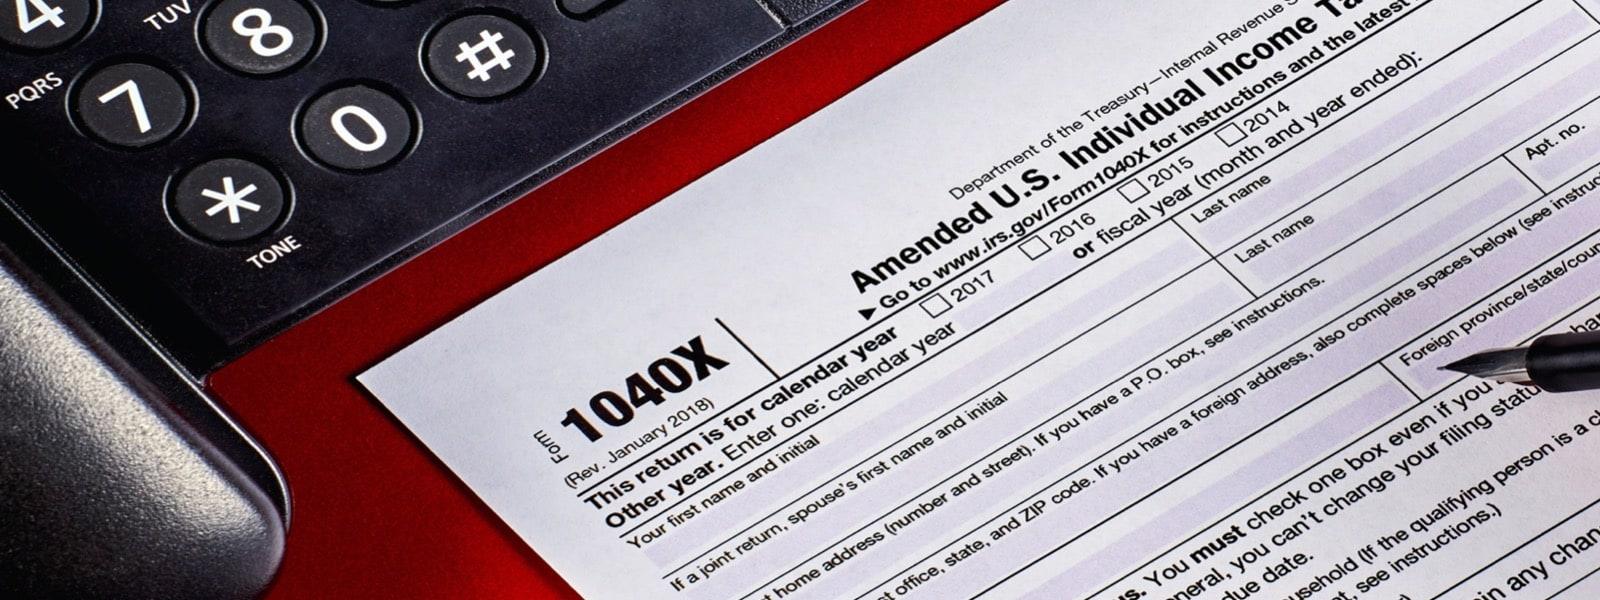 1040x-amended-US-individual-income-tax-return.jpeg